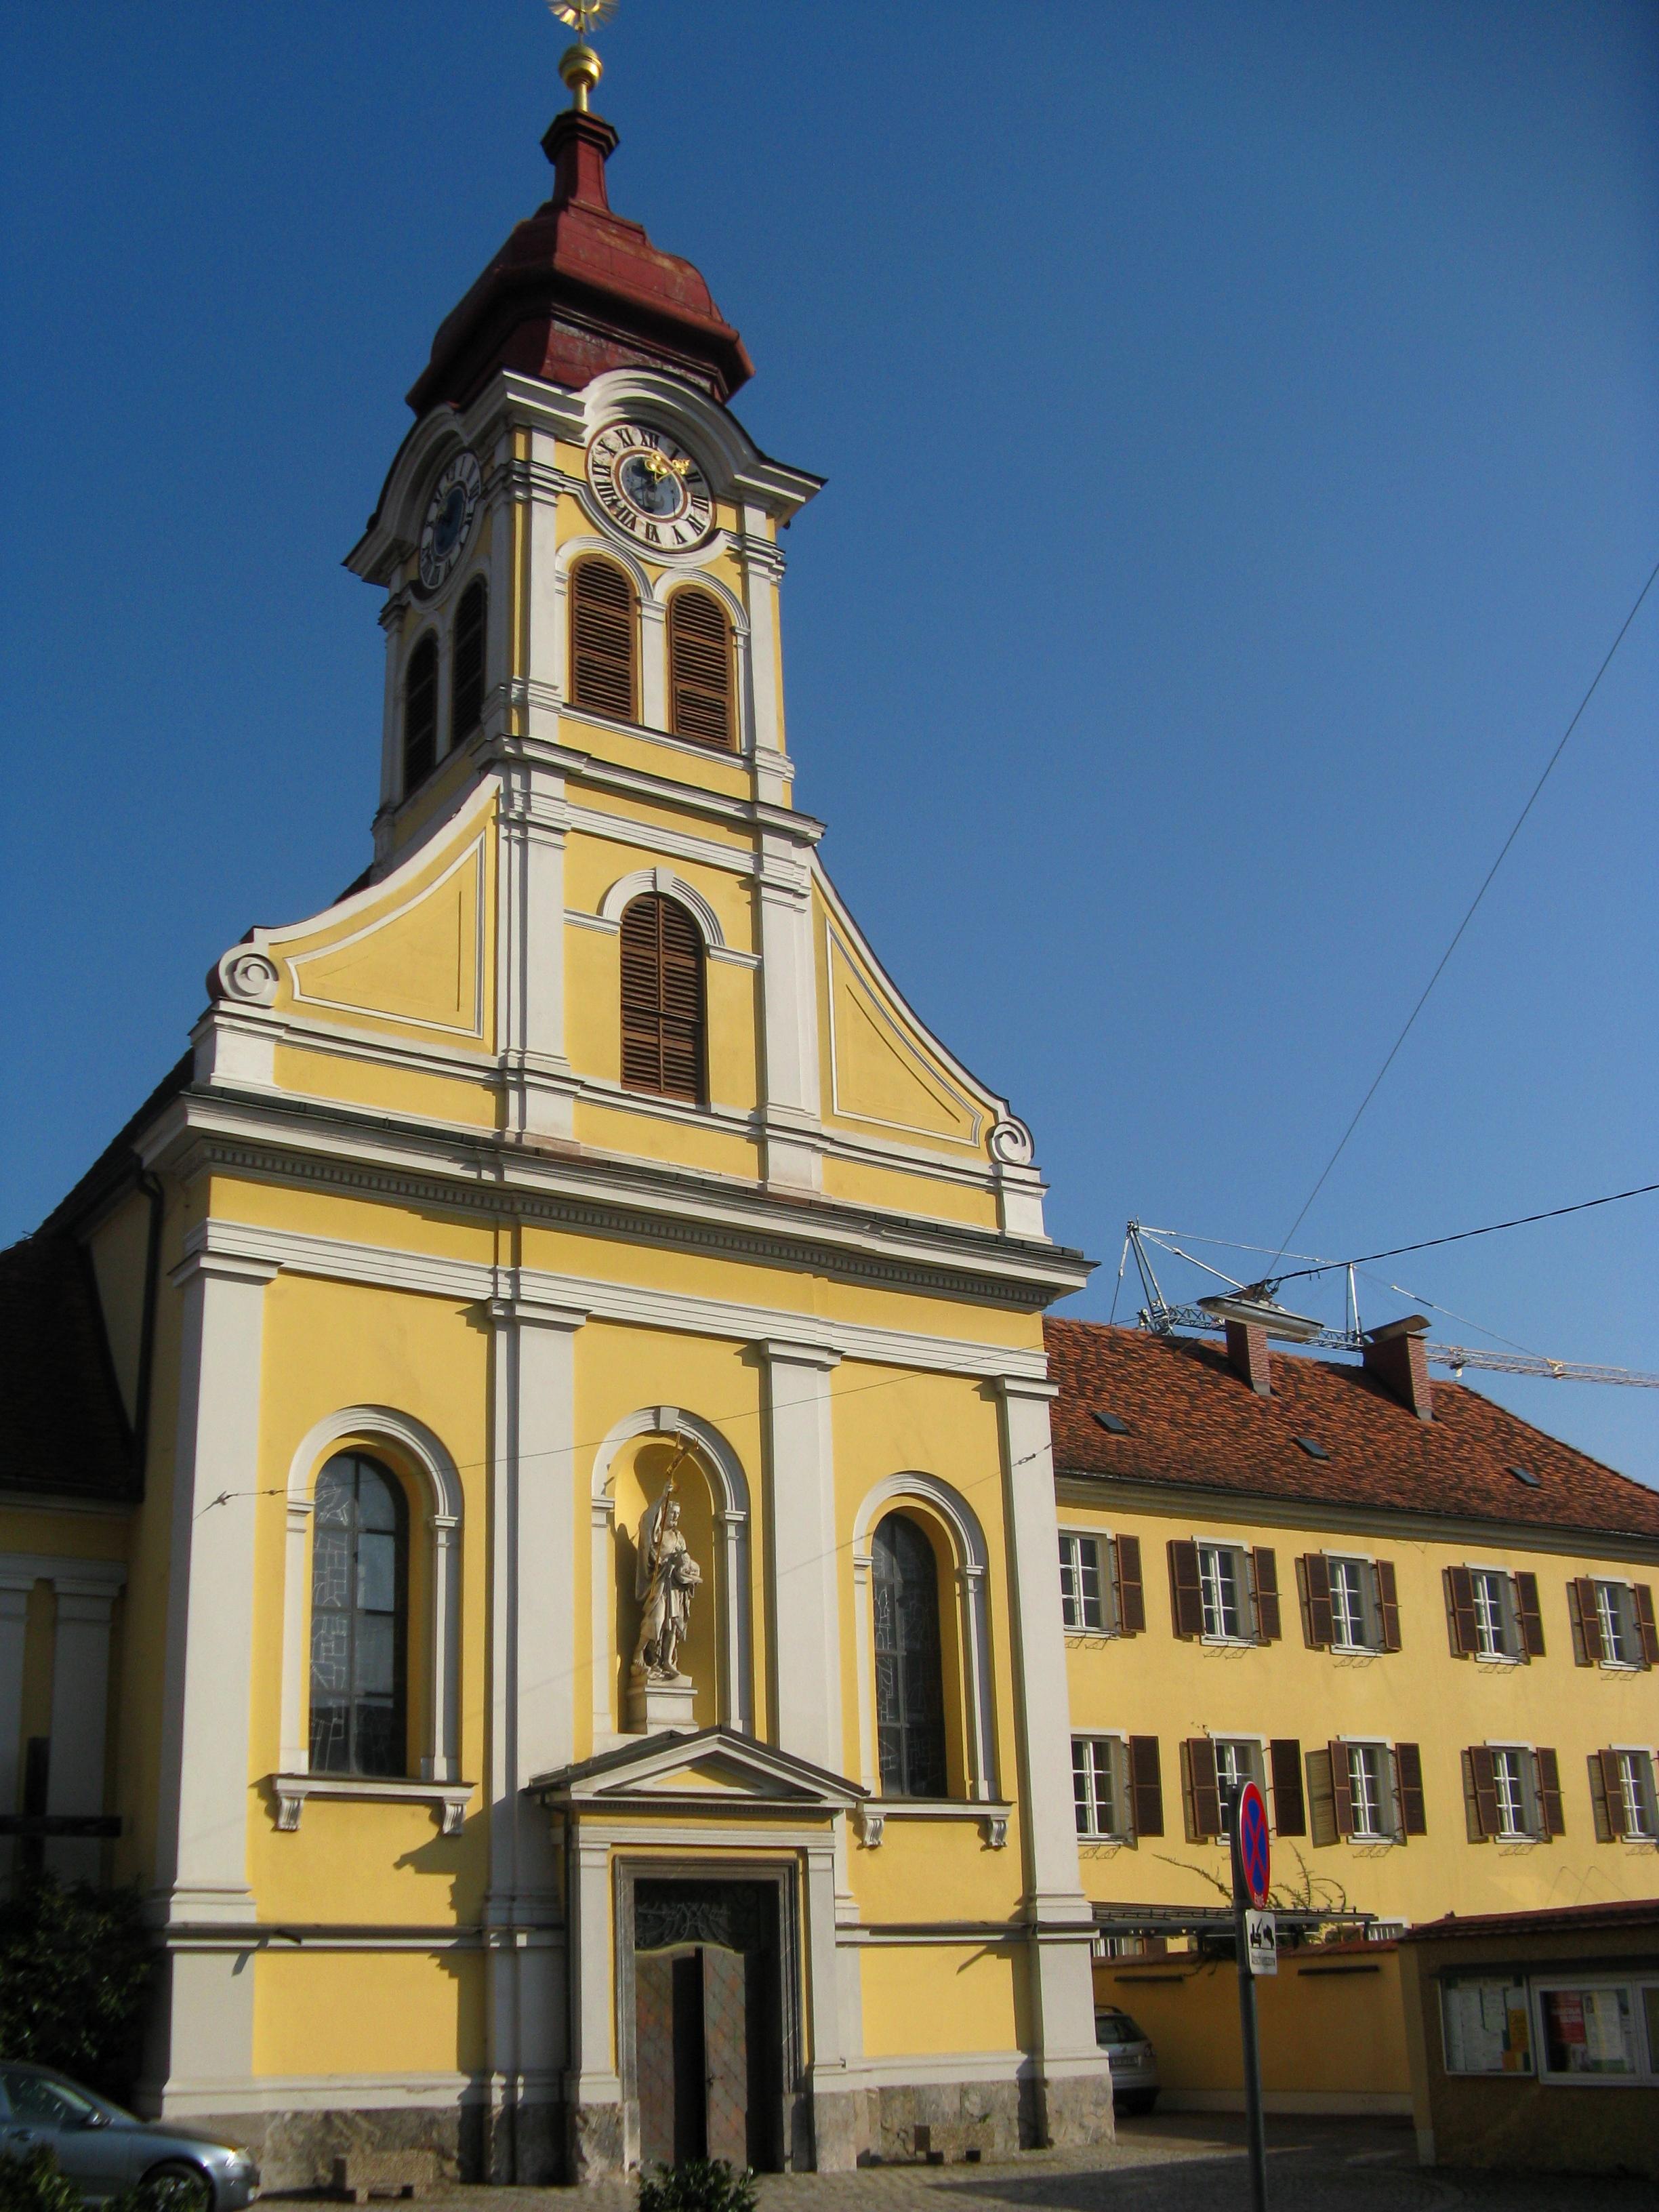 Grabenkirche